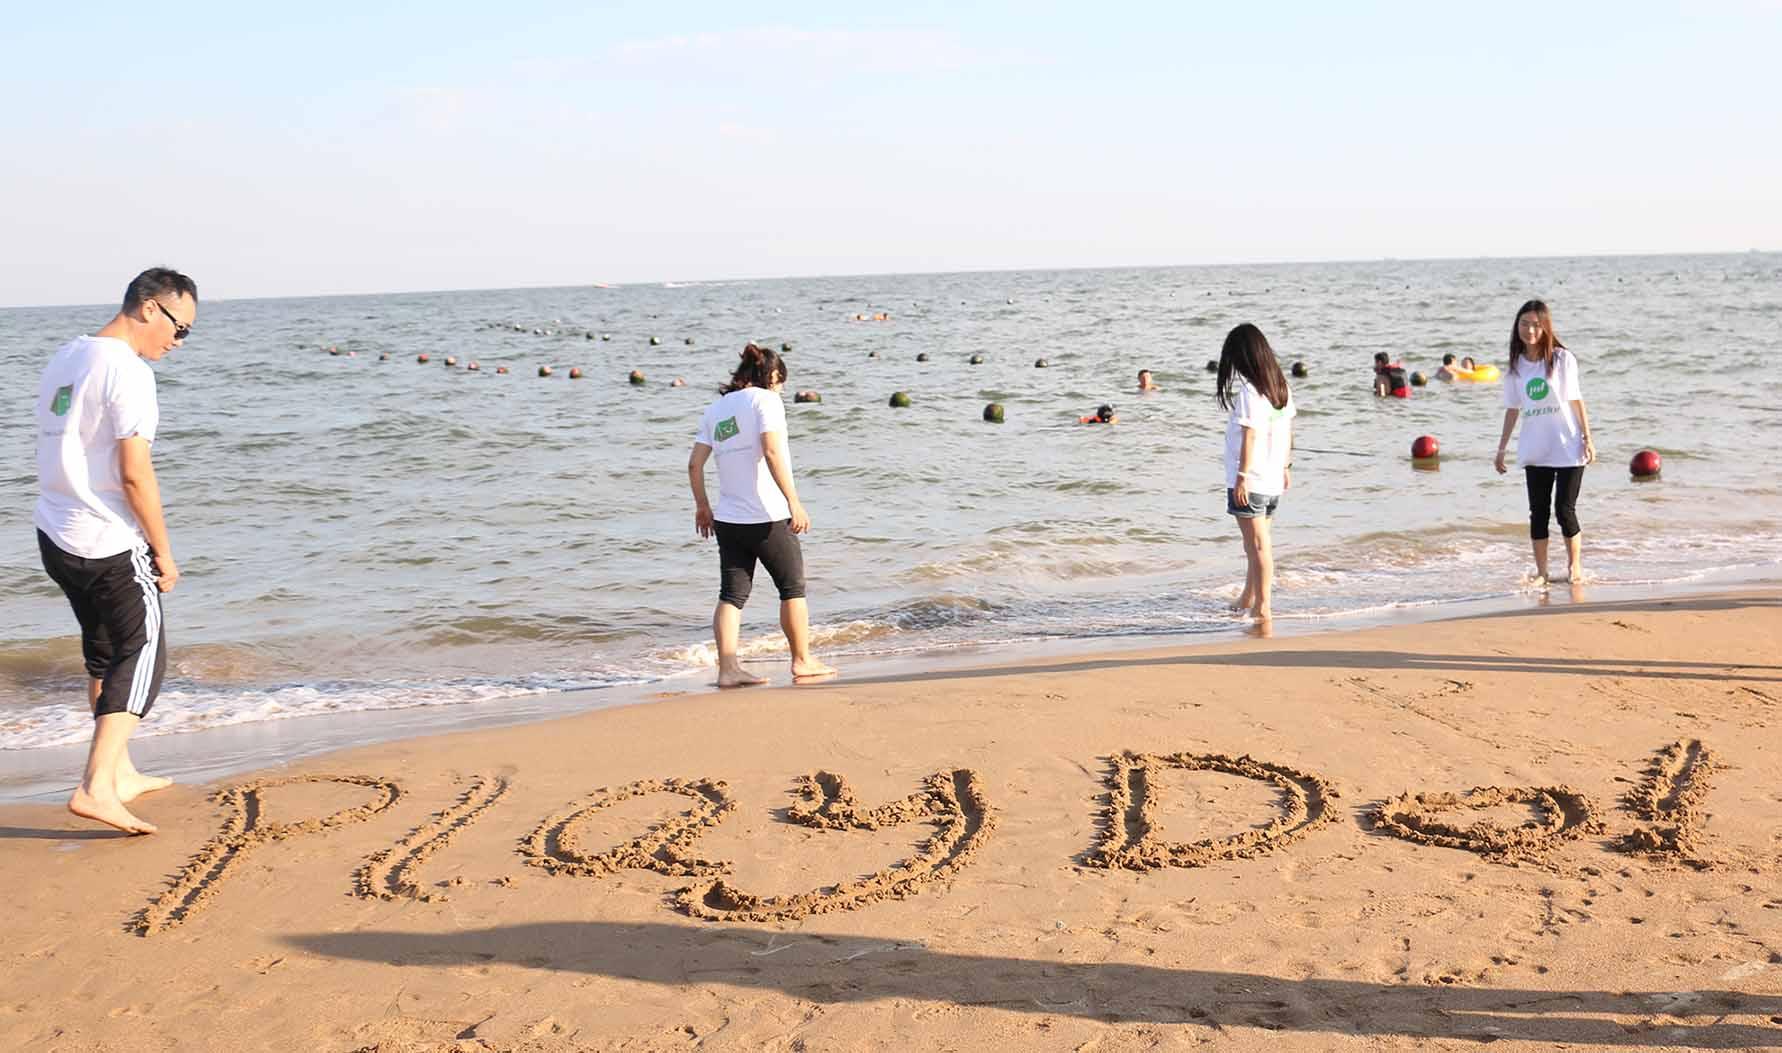 2016.08.26~28 PLAYDO Activity - Go Camping To Famous Beidaihe Tourist Resorts